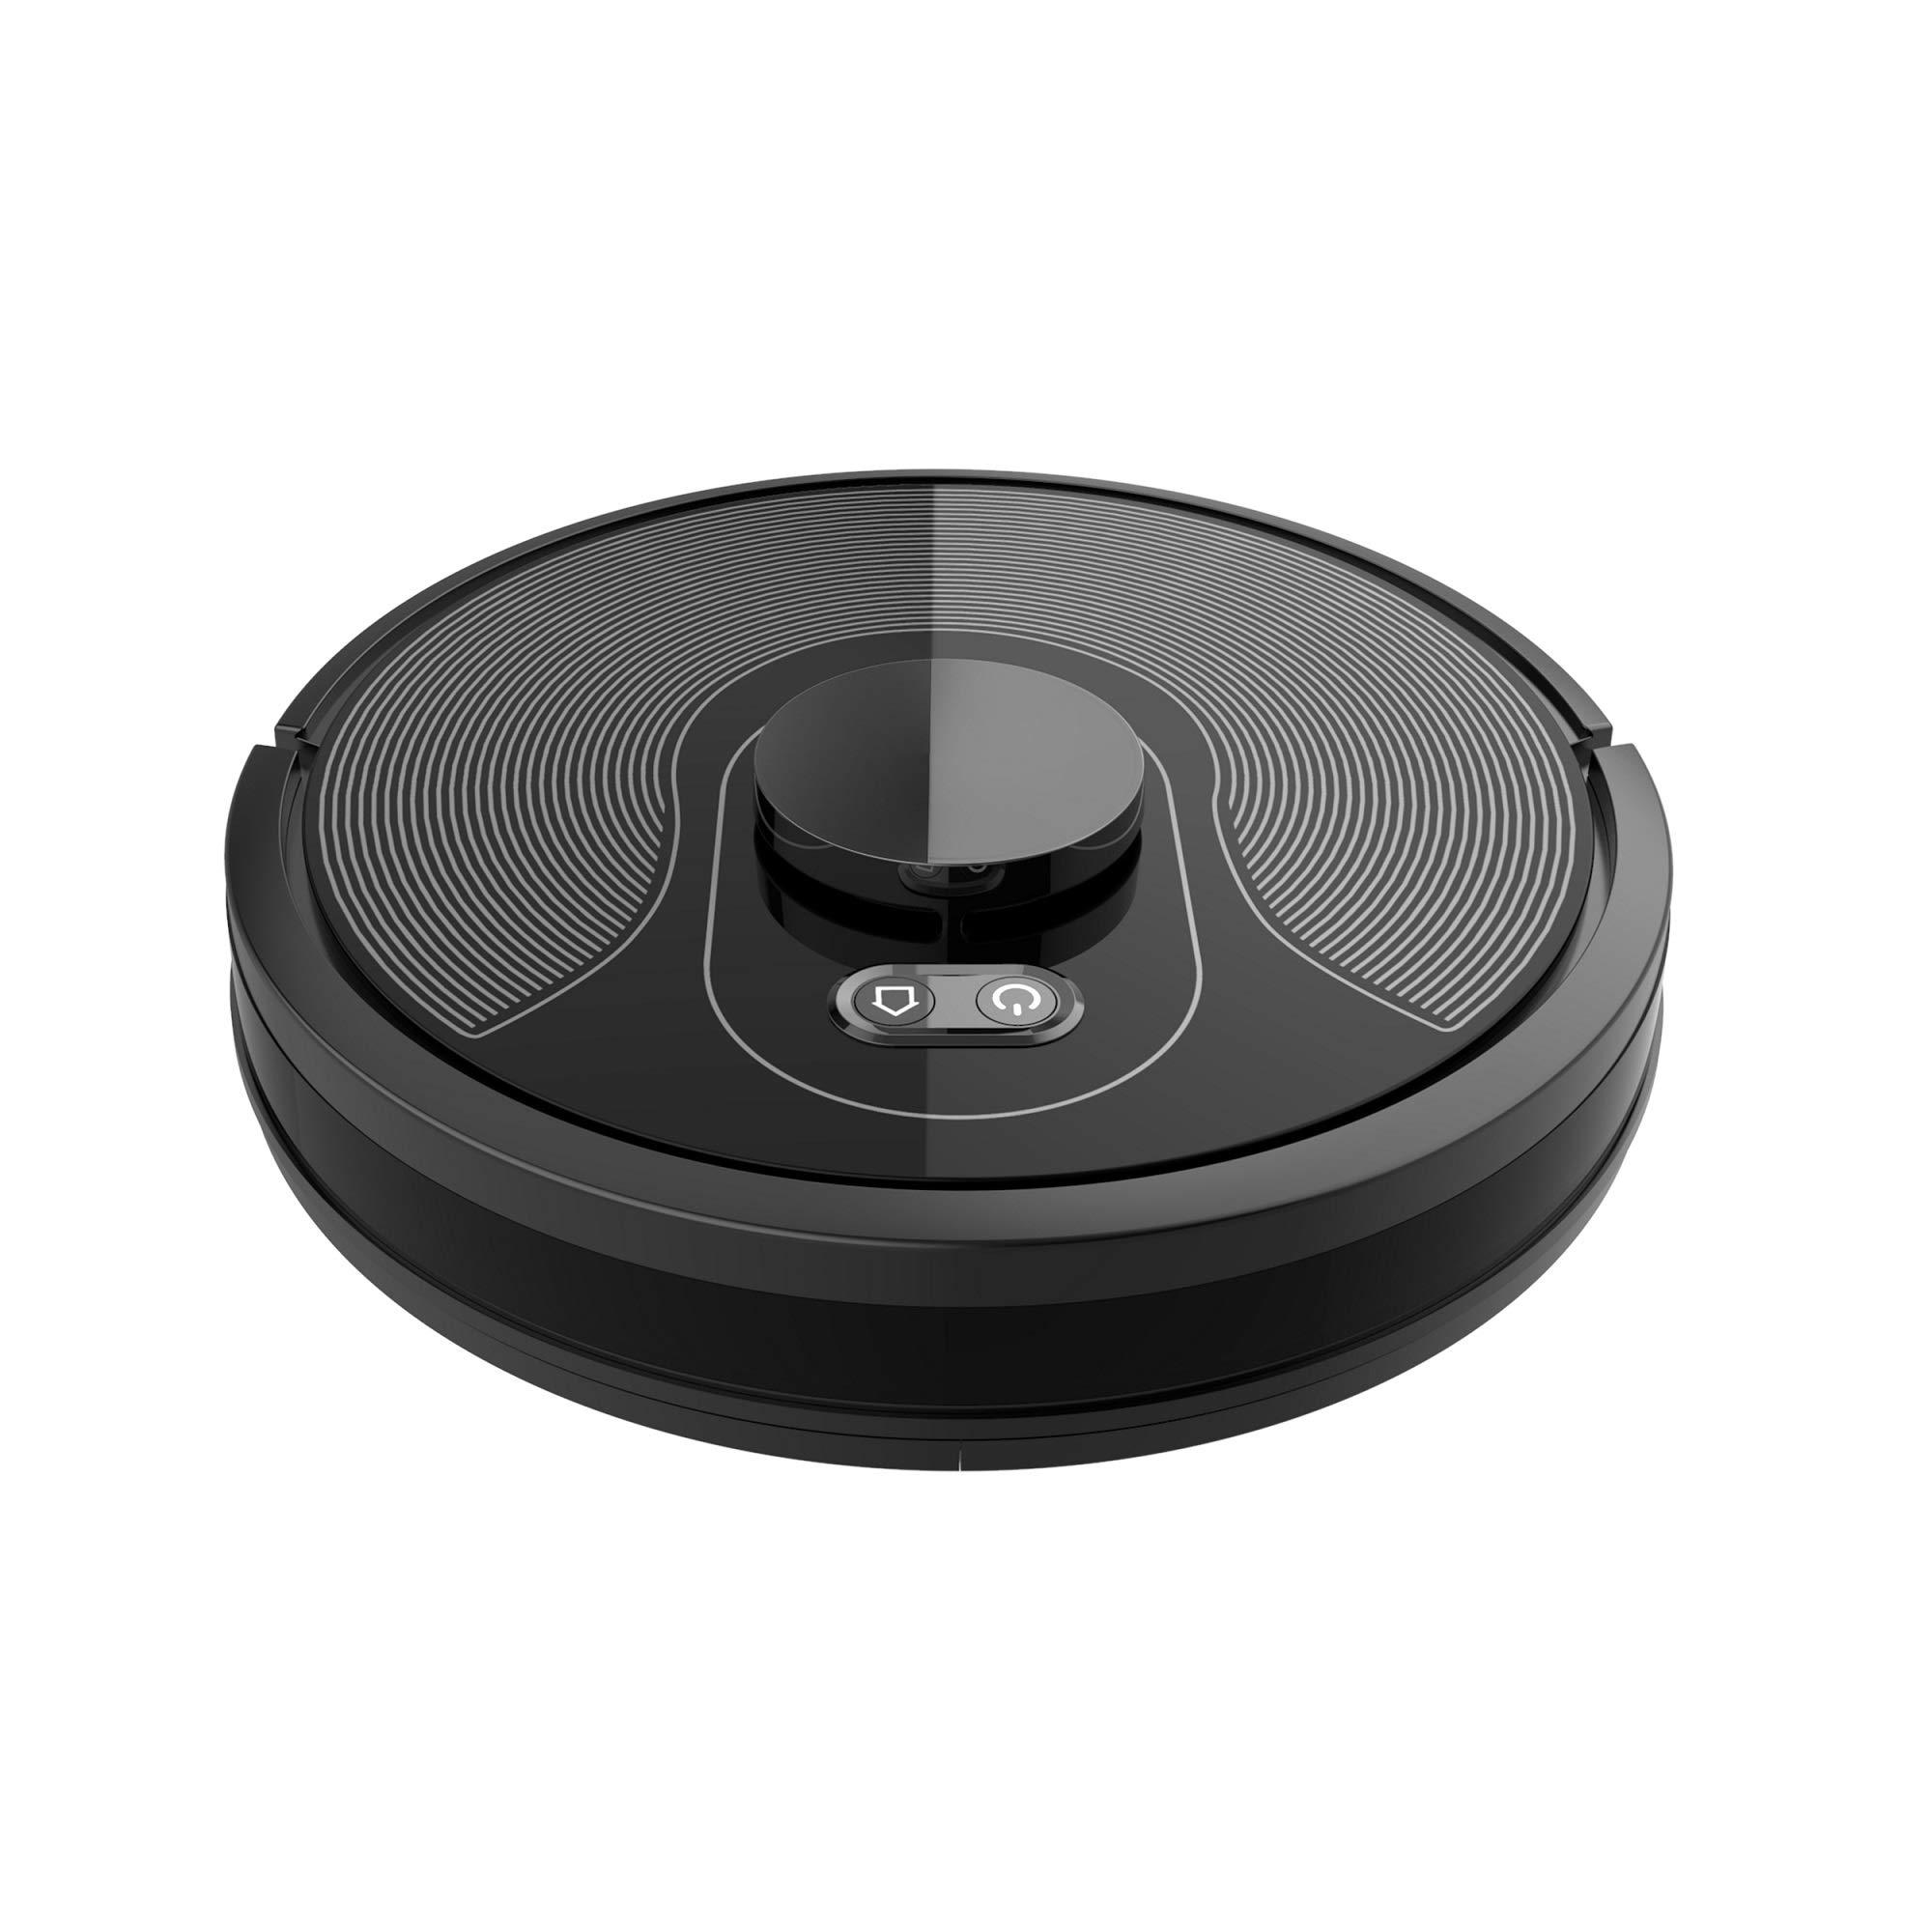 Robot aspirador con función de limpieza, robot de aspiración, navegación por láser con base de carga Alexa, compatible con control de aplicación, limpiador de vacío para el hogar: Amazon.es: Hogar